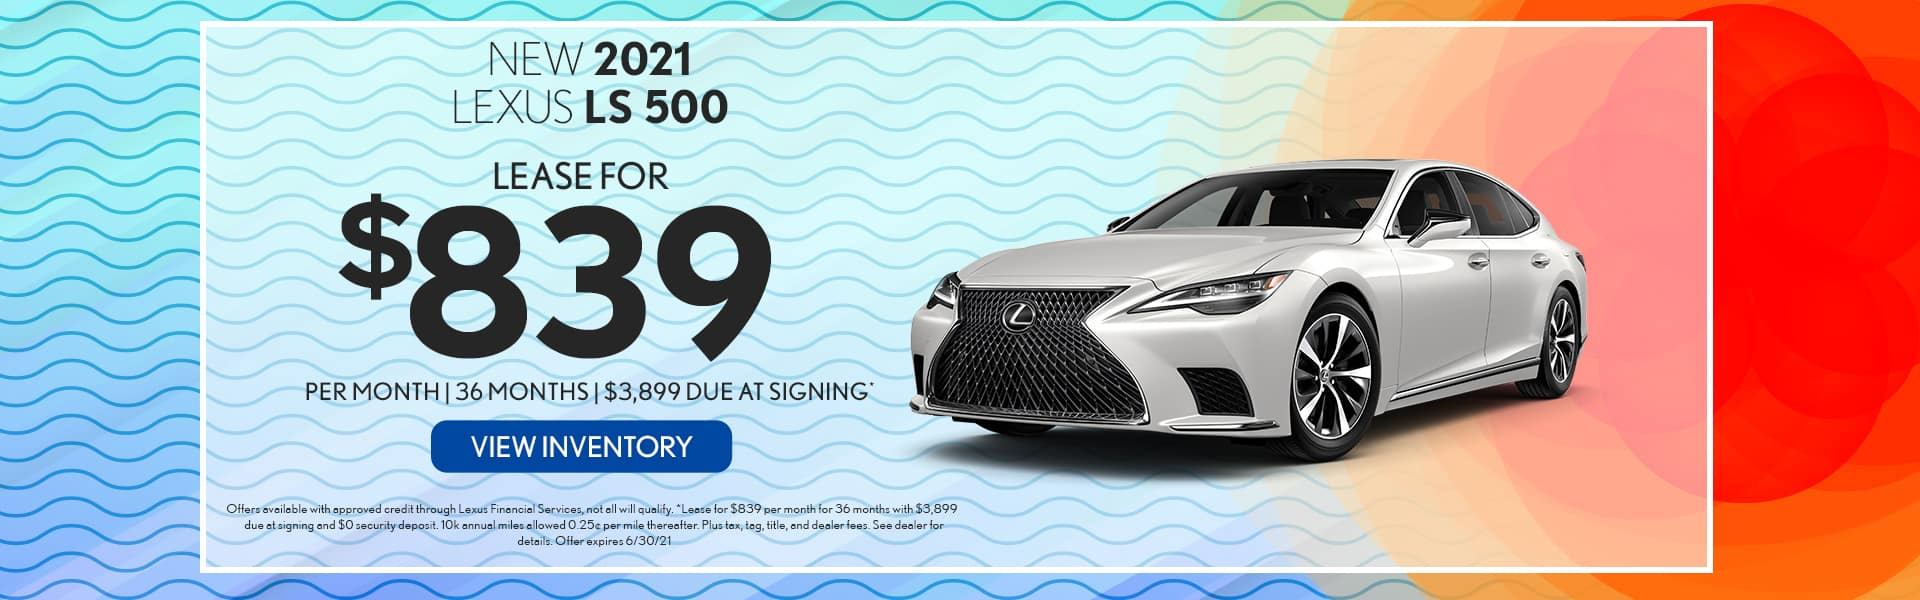 2021 Lexus LS 500 for lease in Mobile, AL